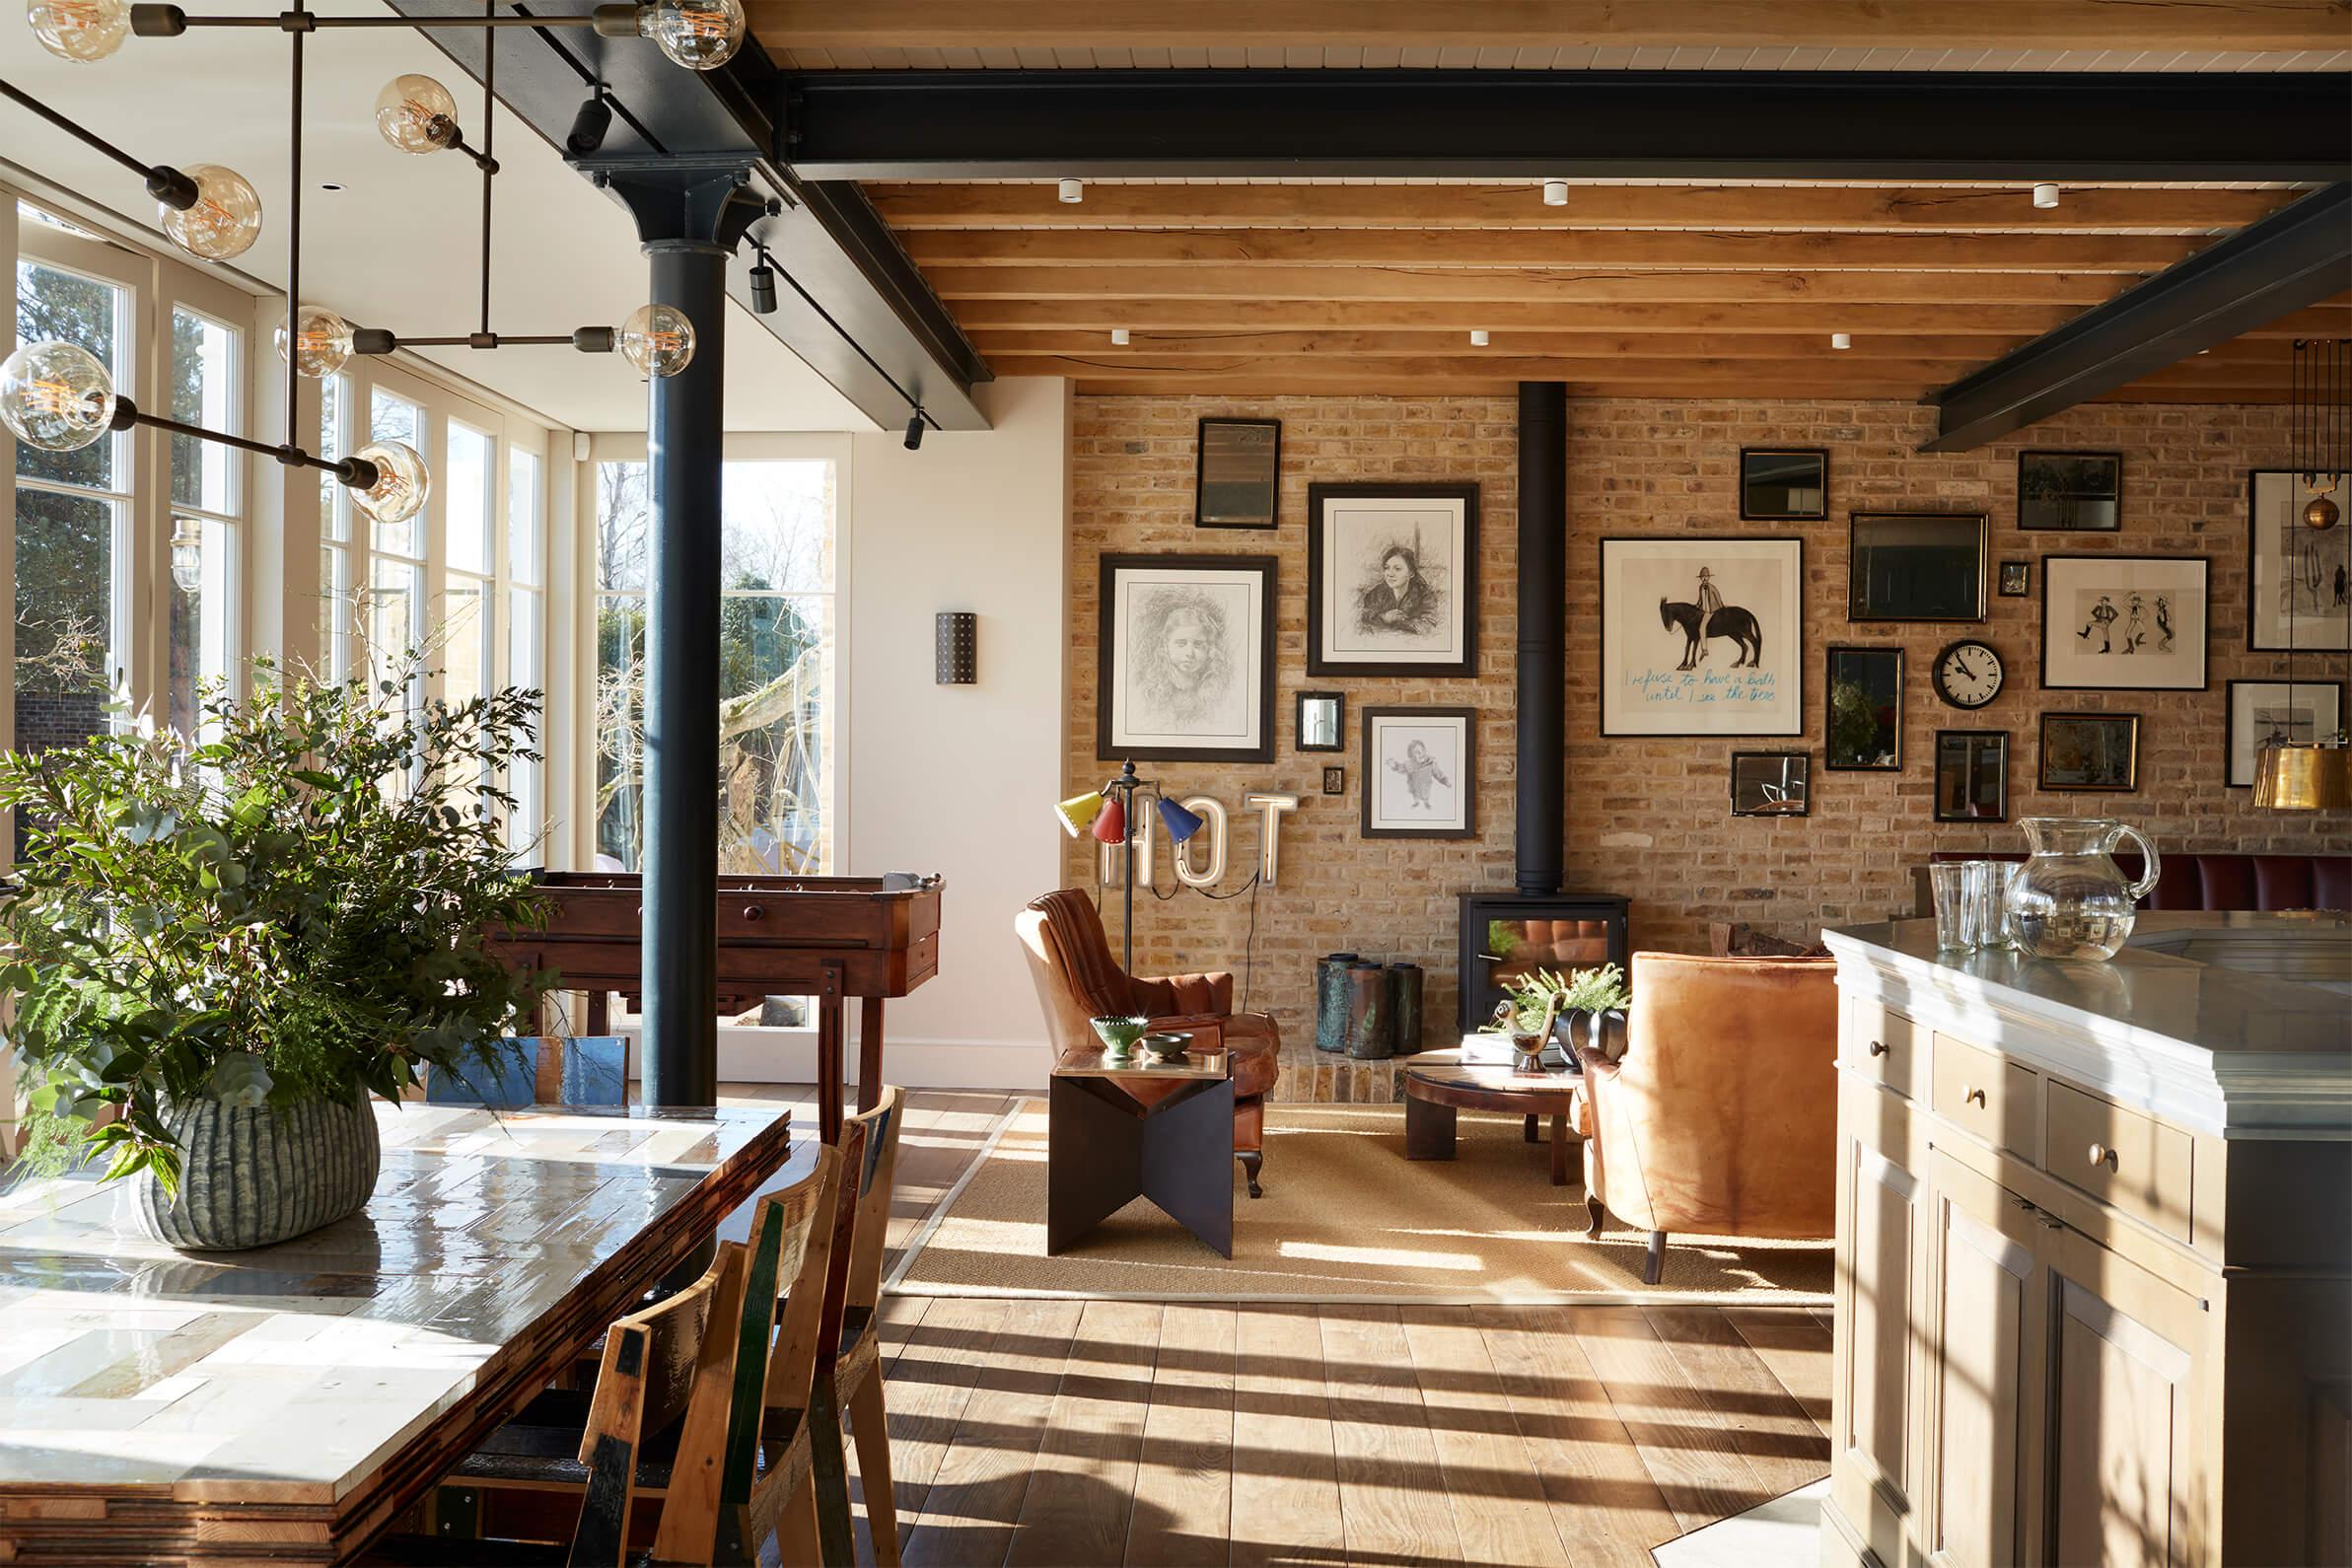 About Studio Indigo Interior Designers Architects London